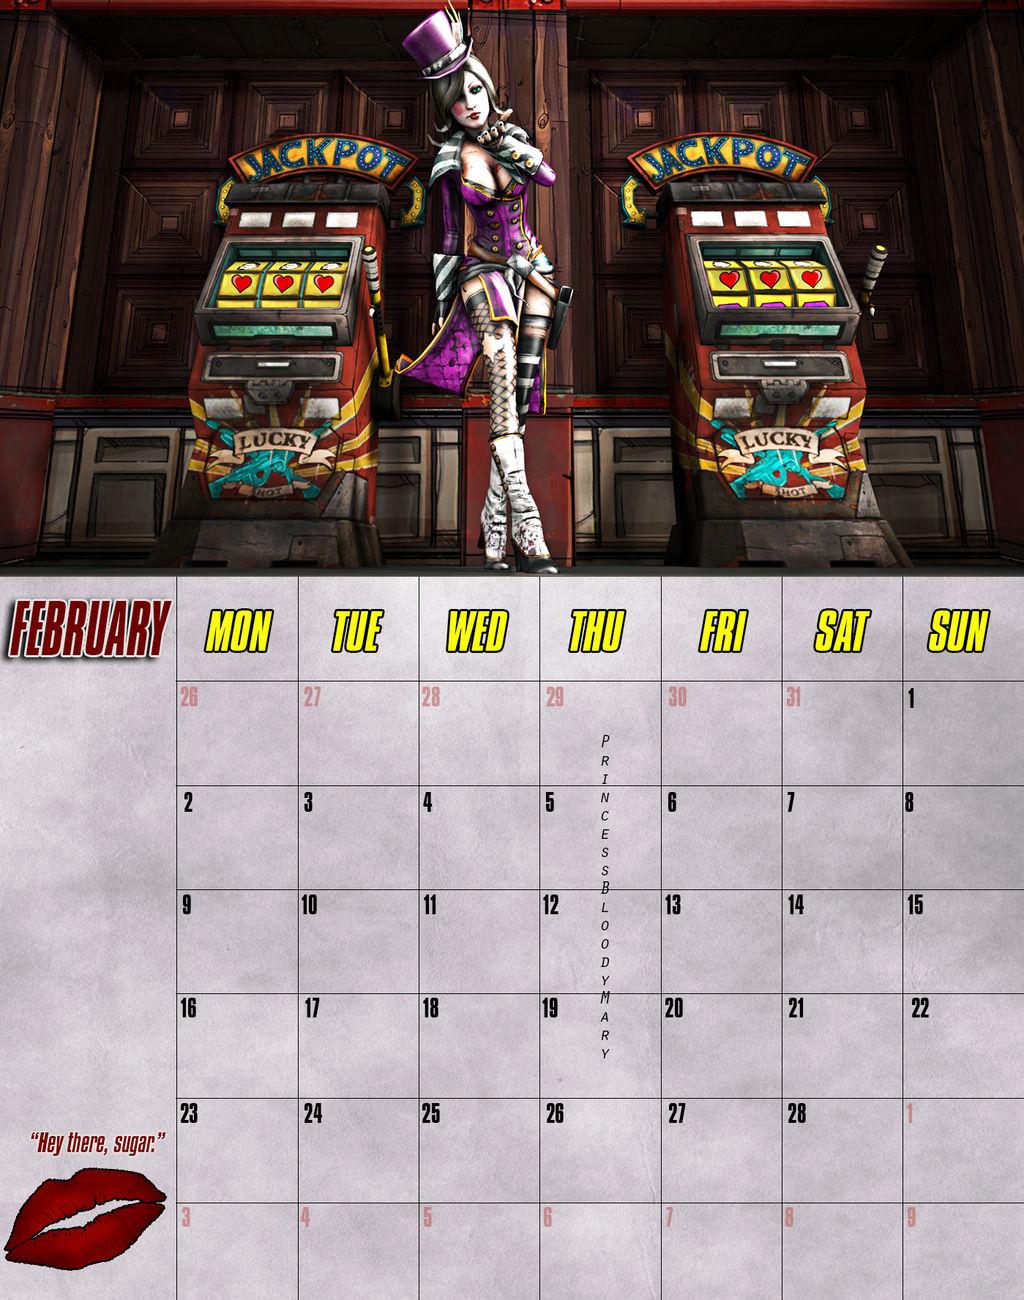 Borderlands Calendar example by PrincessBloodyMary on DeviantArt